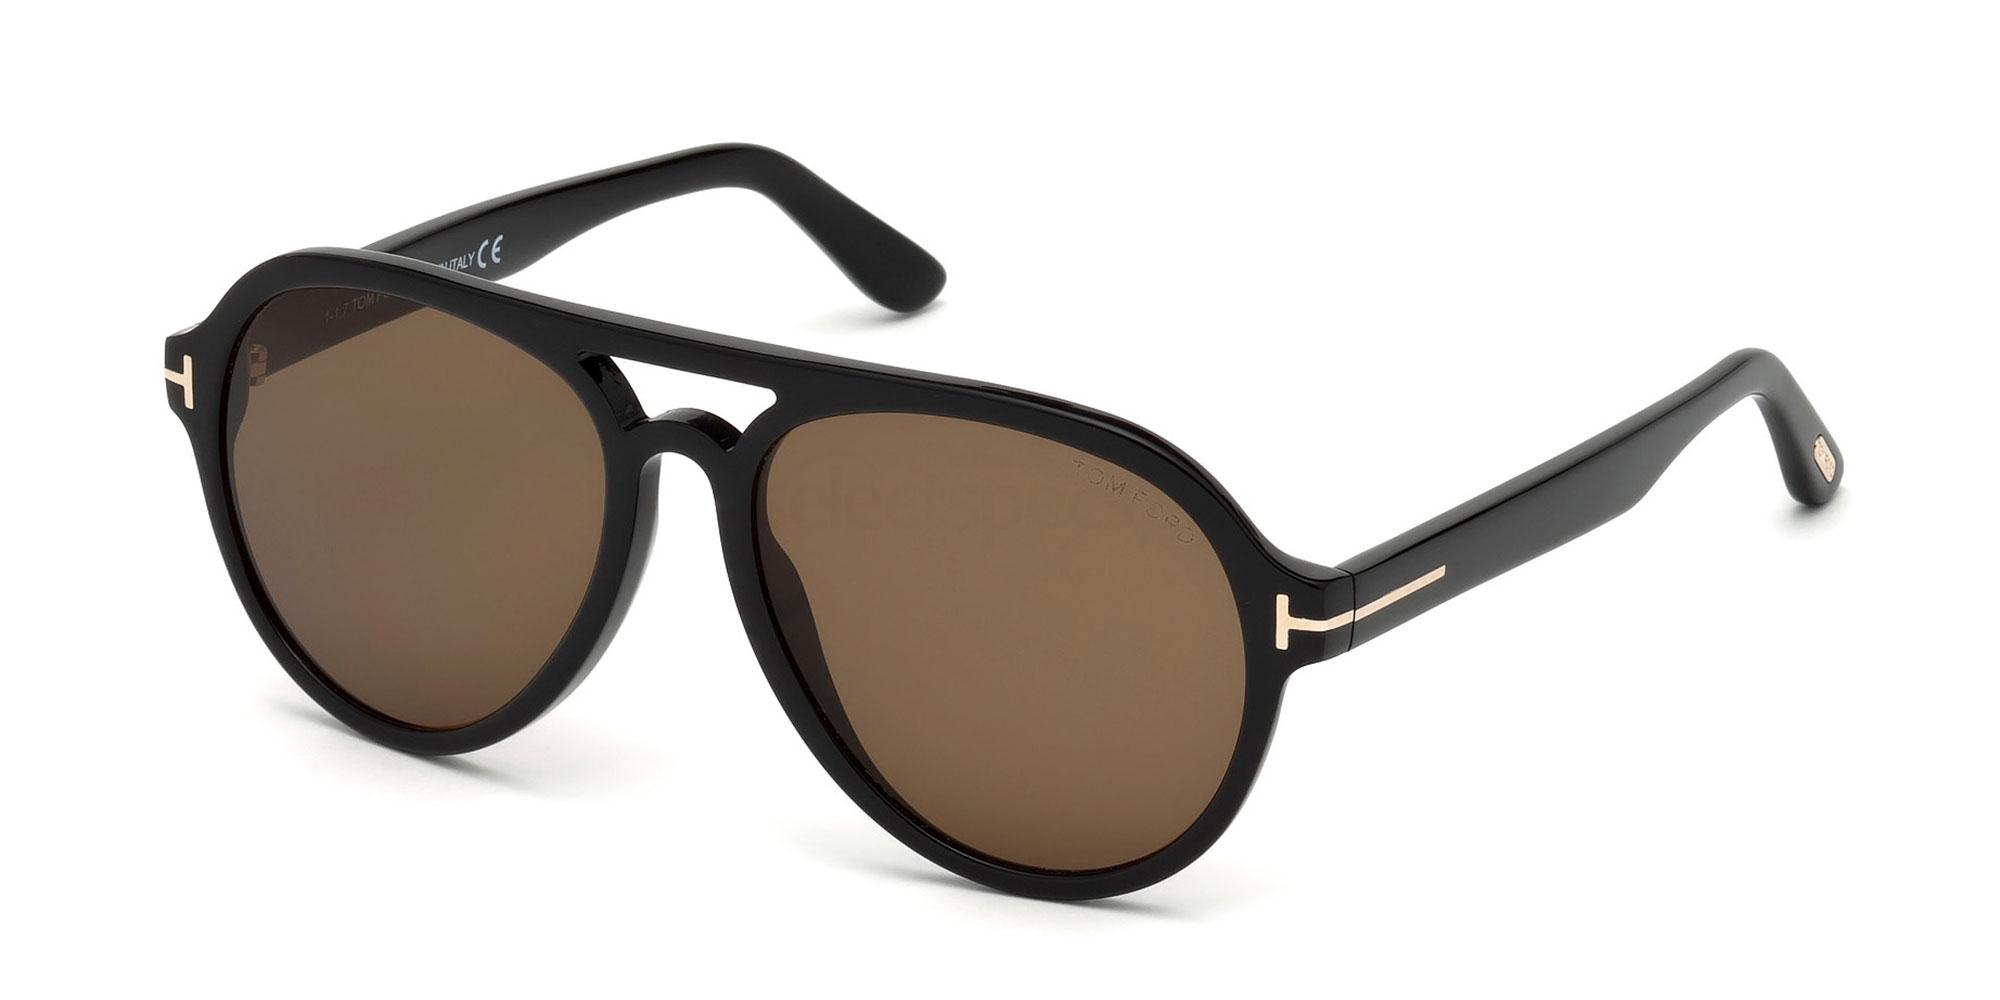 01J FT0596 Sunglasses, Tom Ford